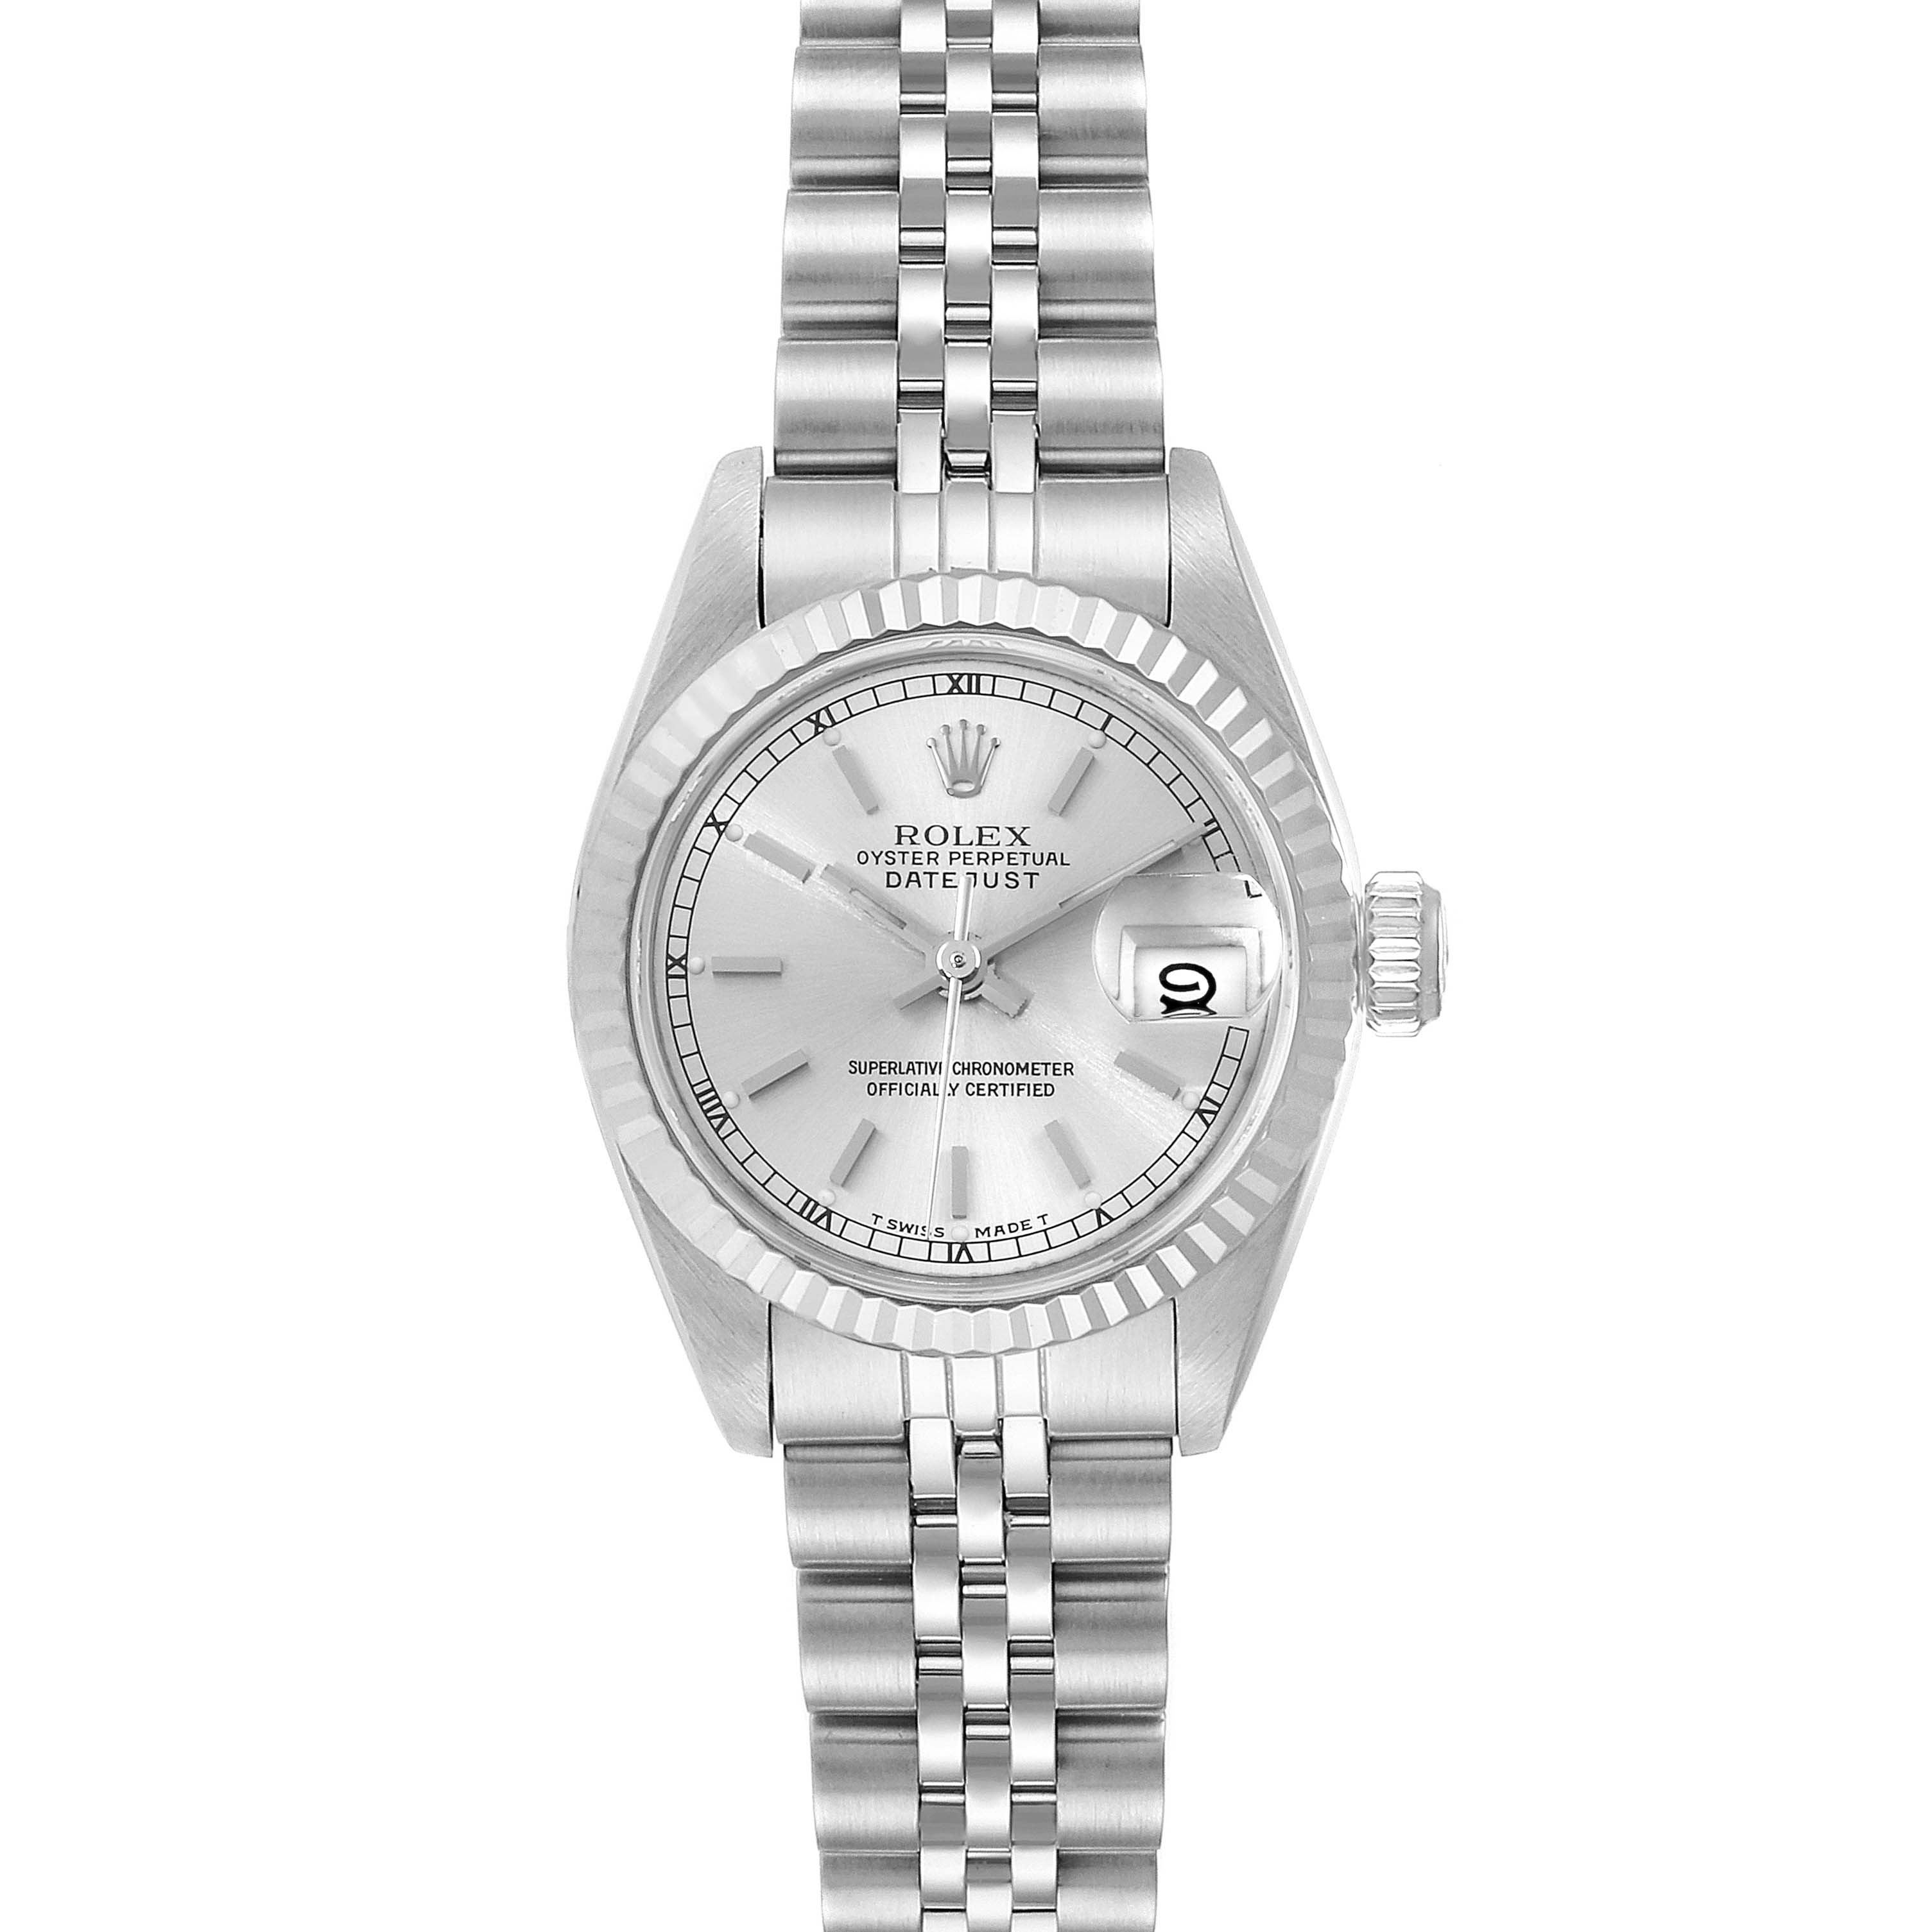 Photo of Rolex Datejust Steel White Gold Jubilee Bracelet Ladies Watch 69174